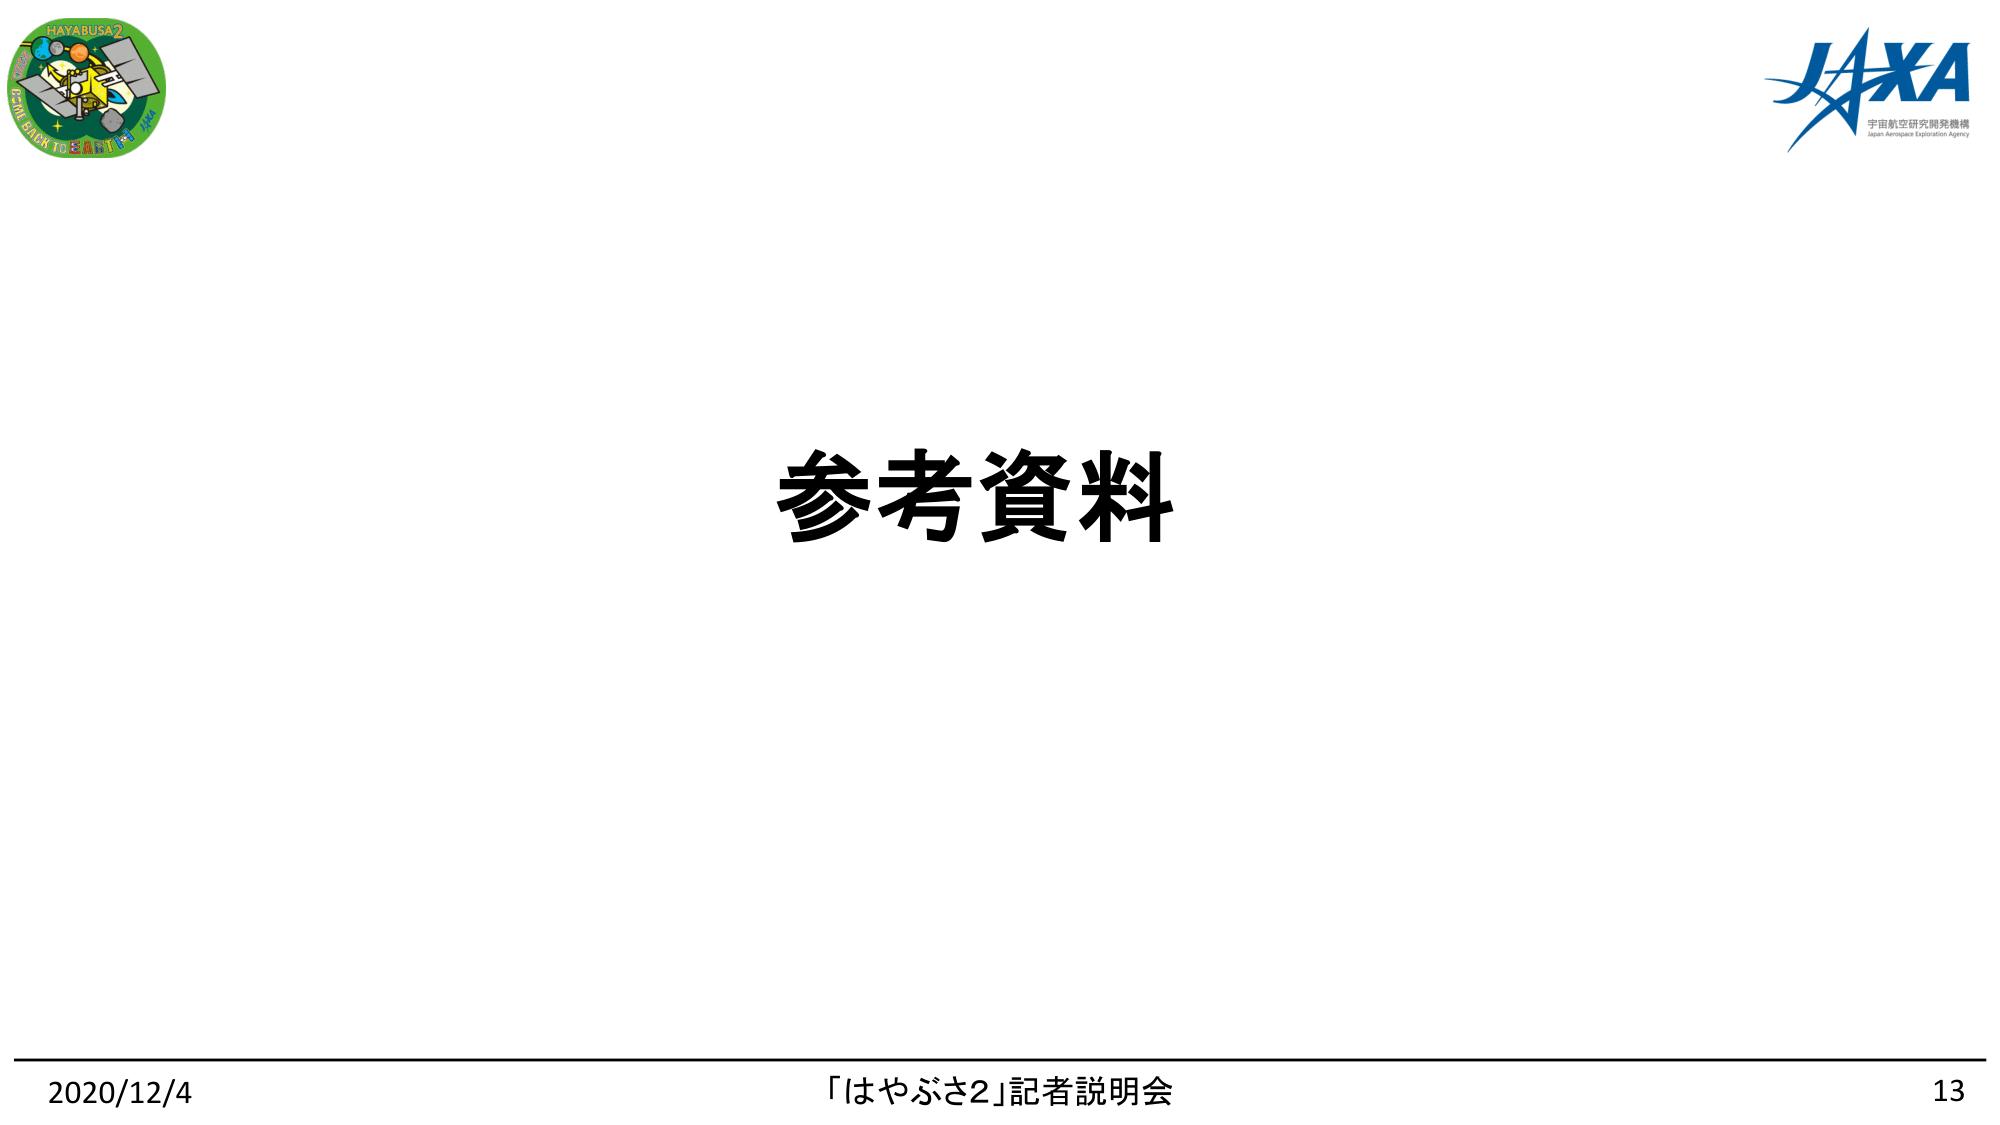 f:id:Imamura:20201204153850p:plain